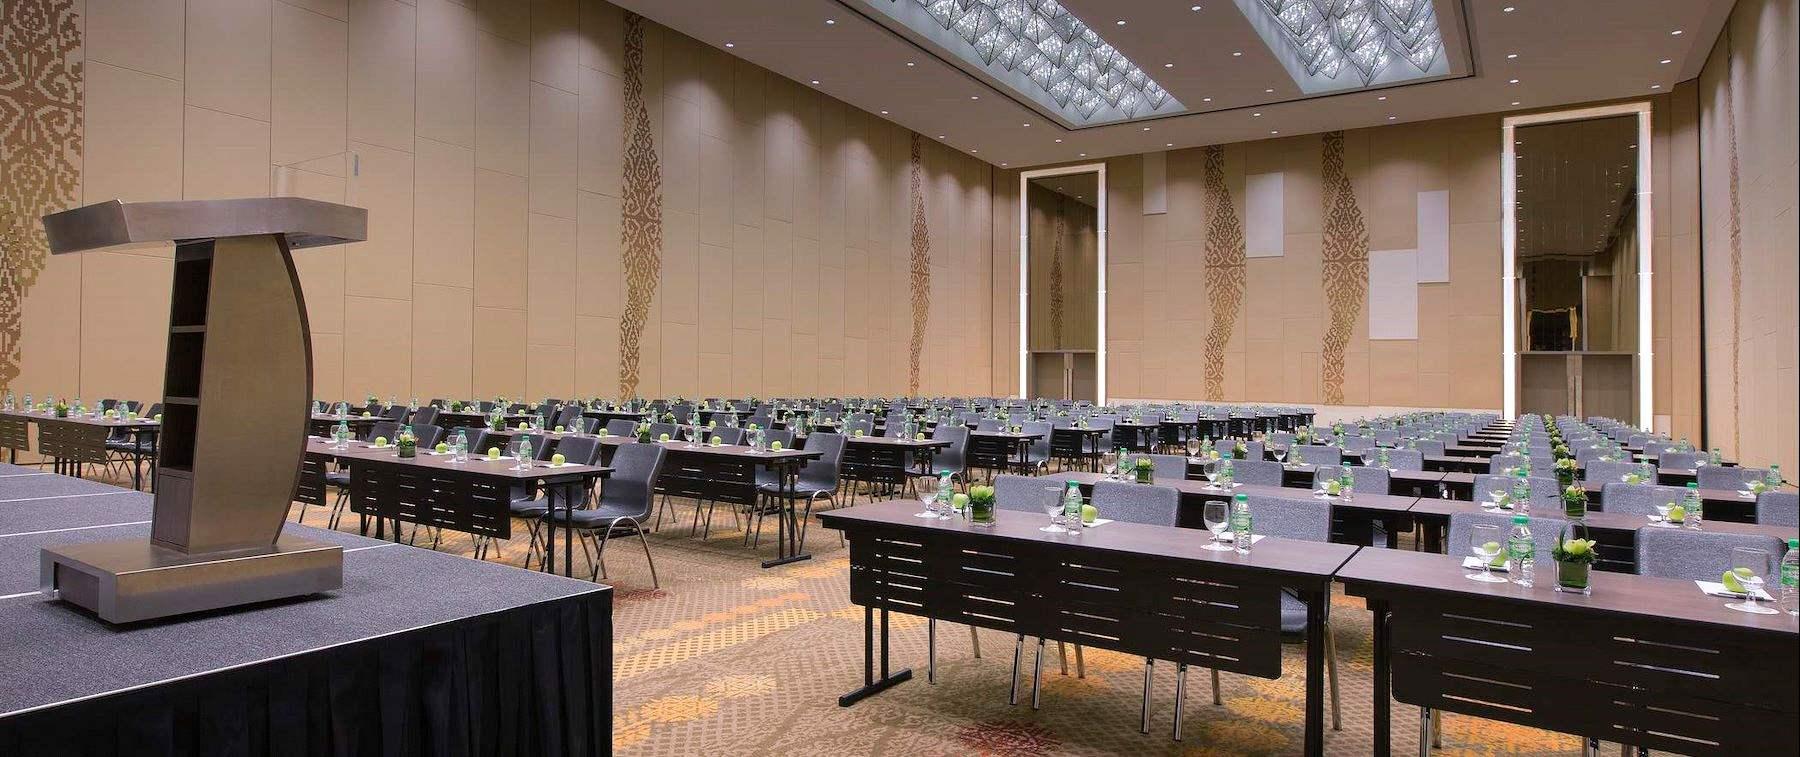 Speaker conference area